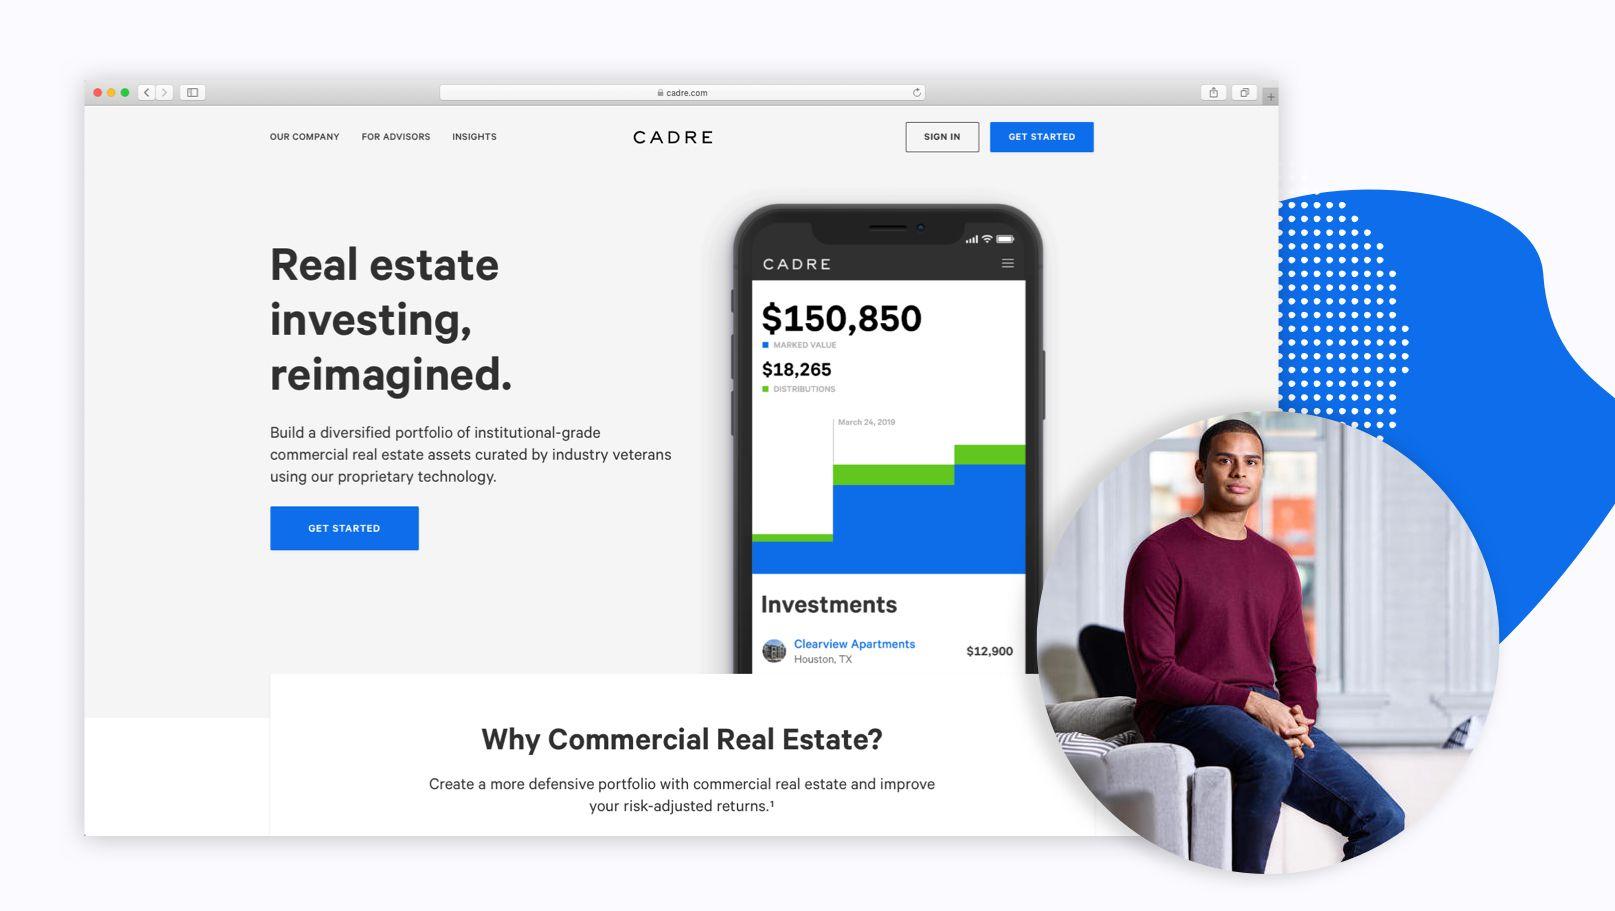 Cadre real estate investing site